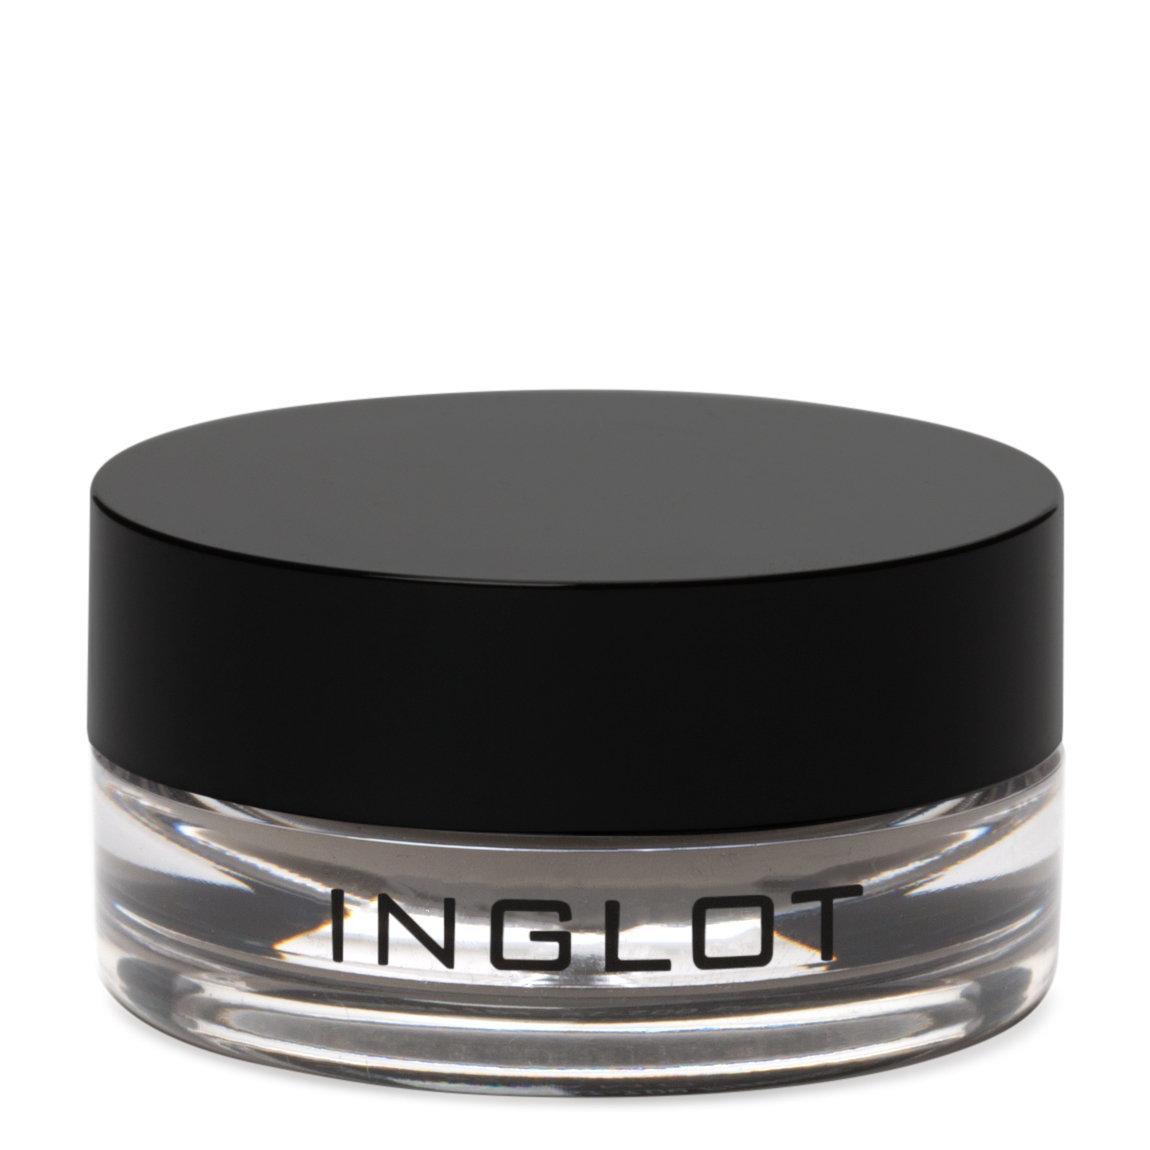 Inglot Cosmetics AMC Brow Liner Gel 18